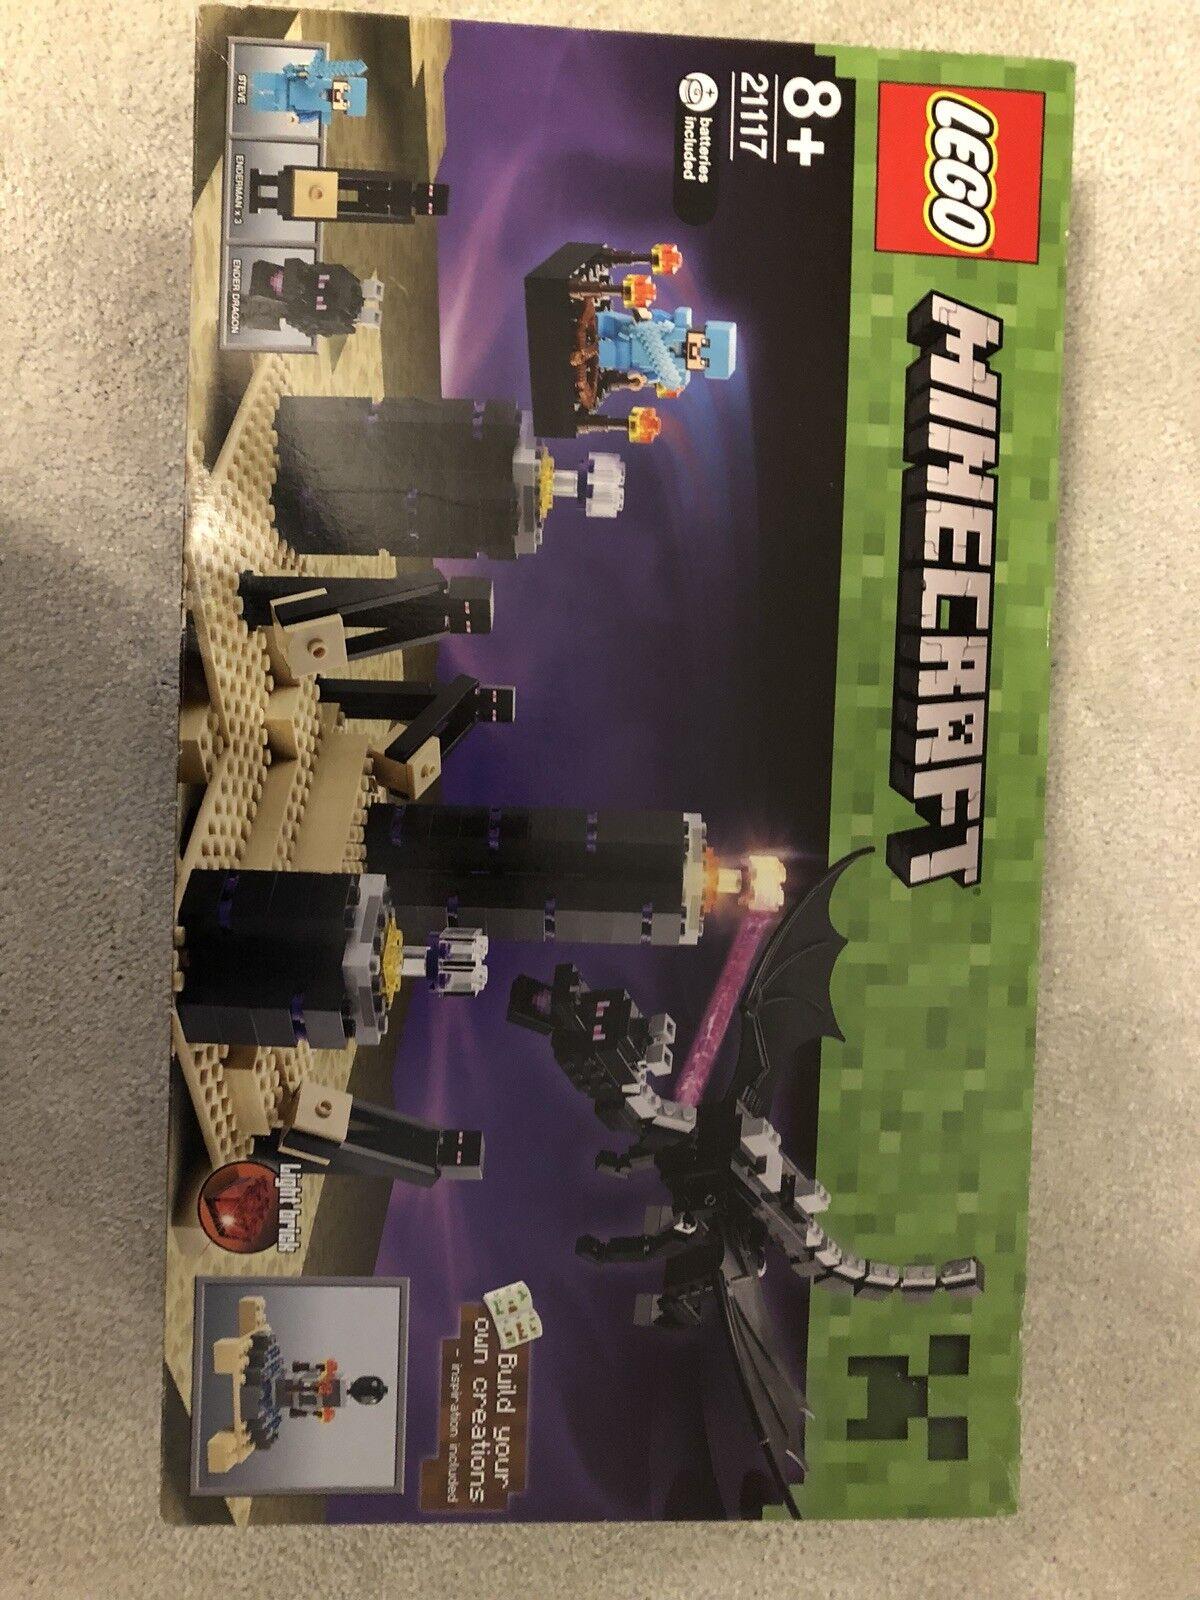 Goût élégant et choix distingué. Lego 21117 Minecraft The Ender Ender Ender Dragon Playset 8b9944